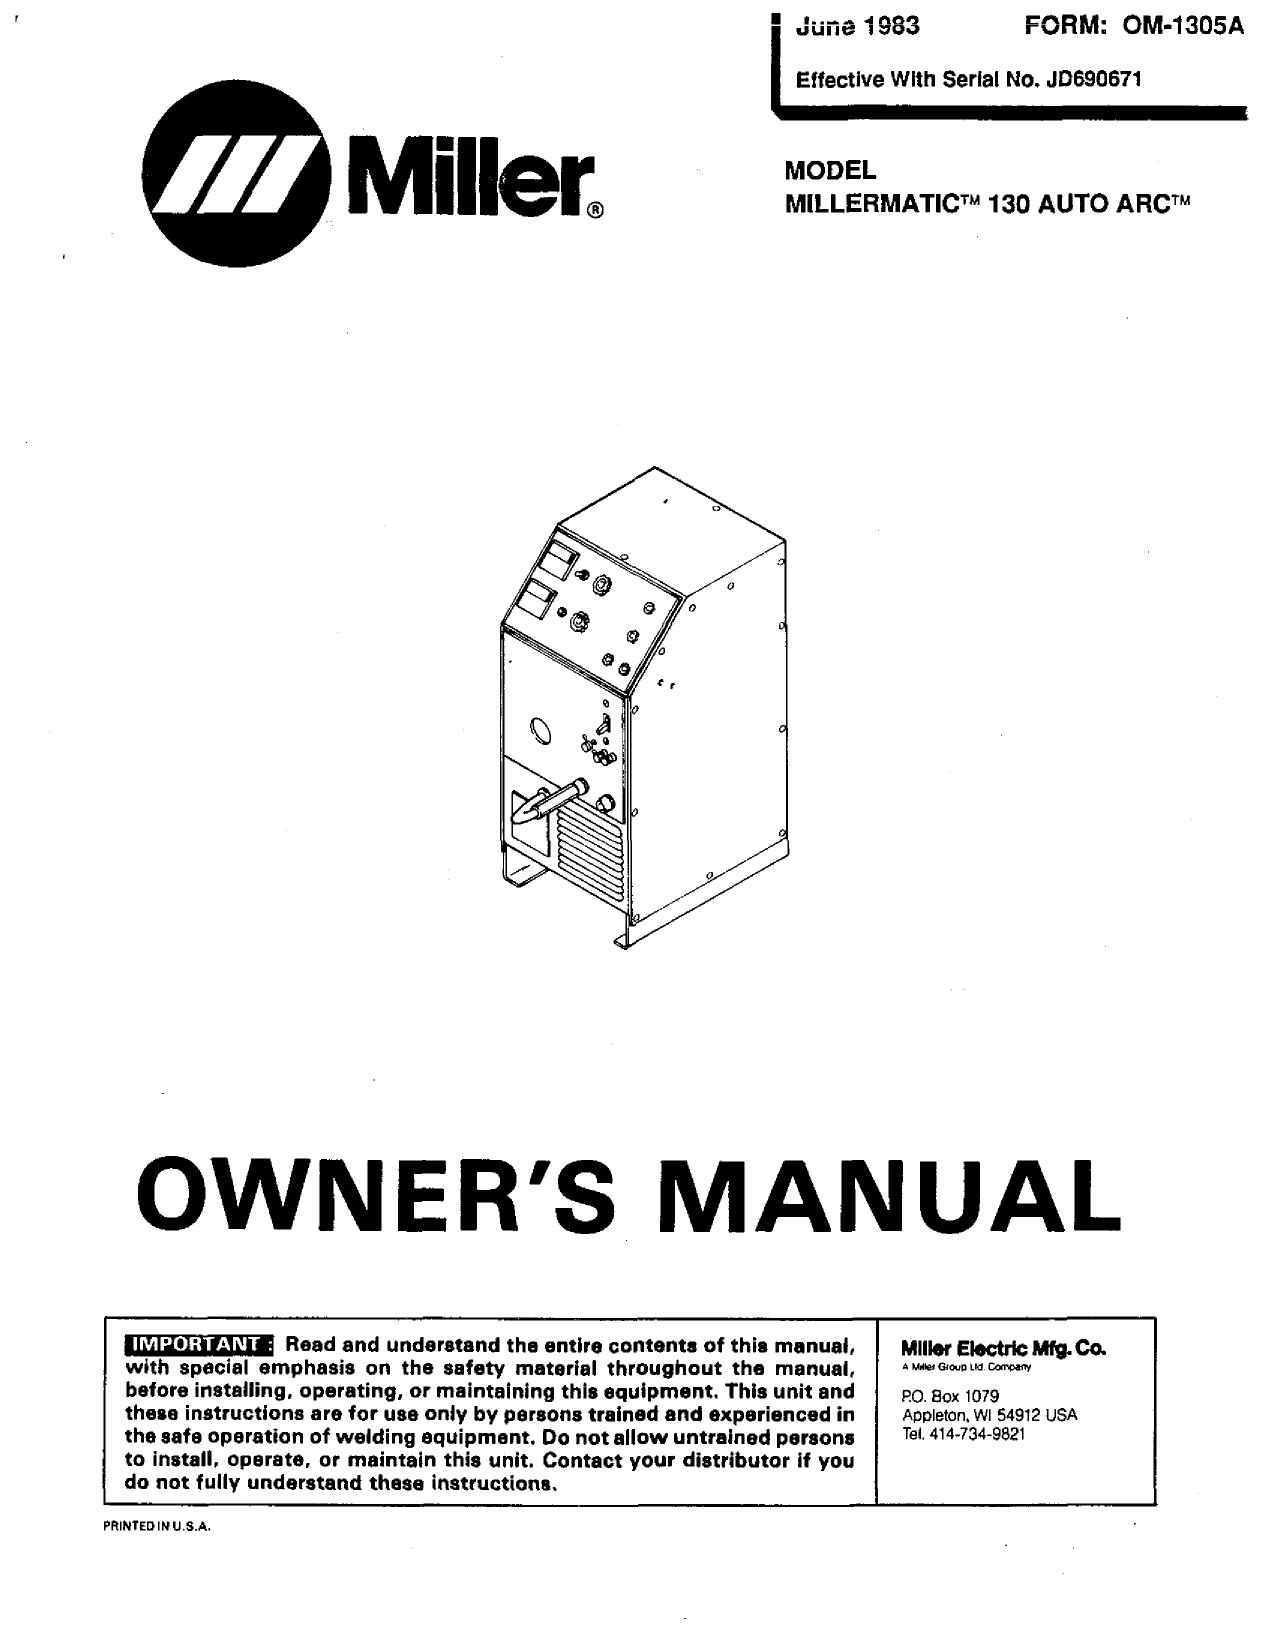 Miller Millermatic 130 Auto Arc User Manual Manualzz